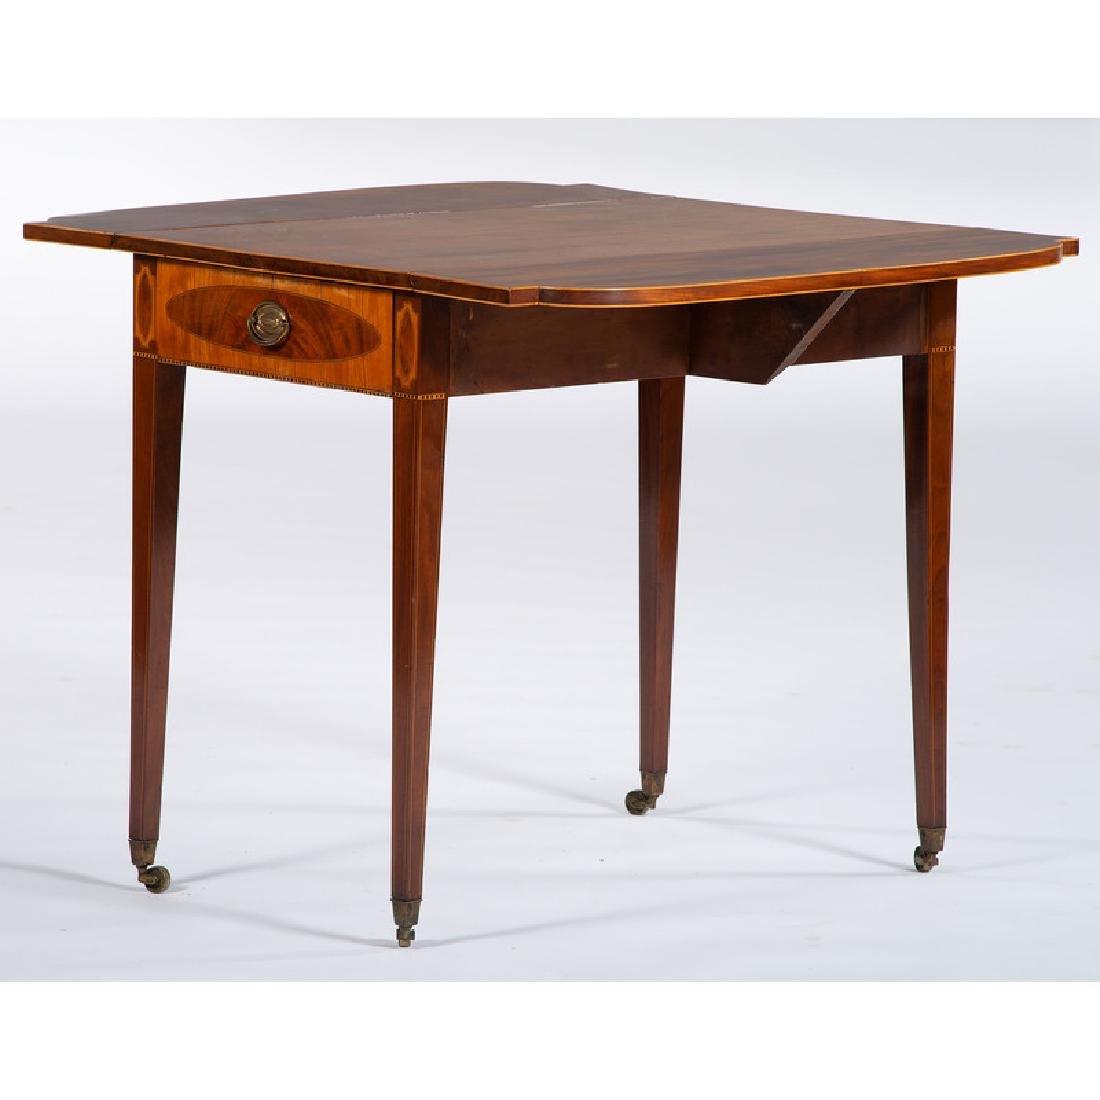 English Hepplewhite Pembroke Table - 2